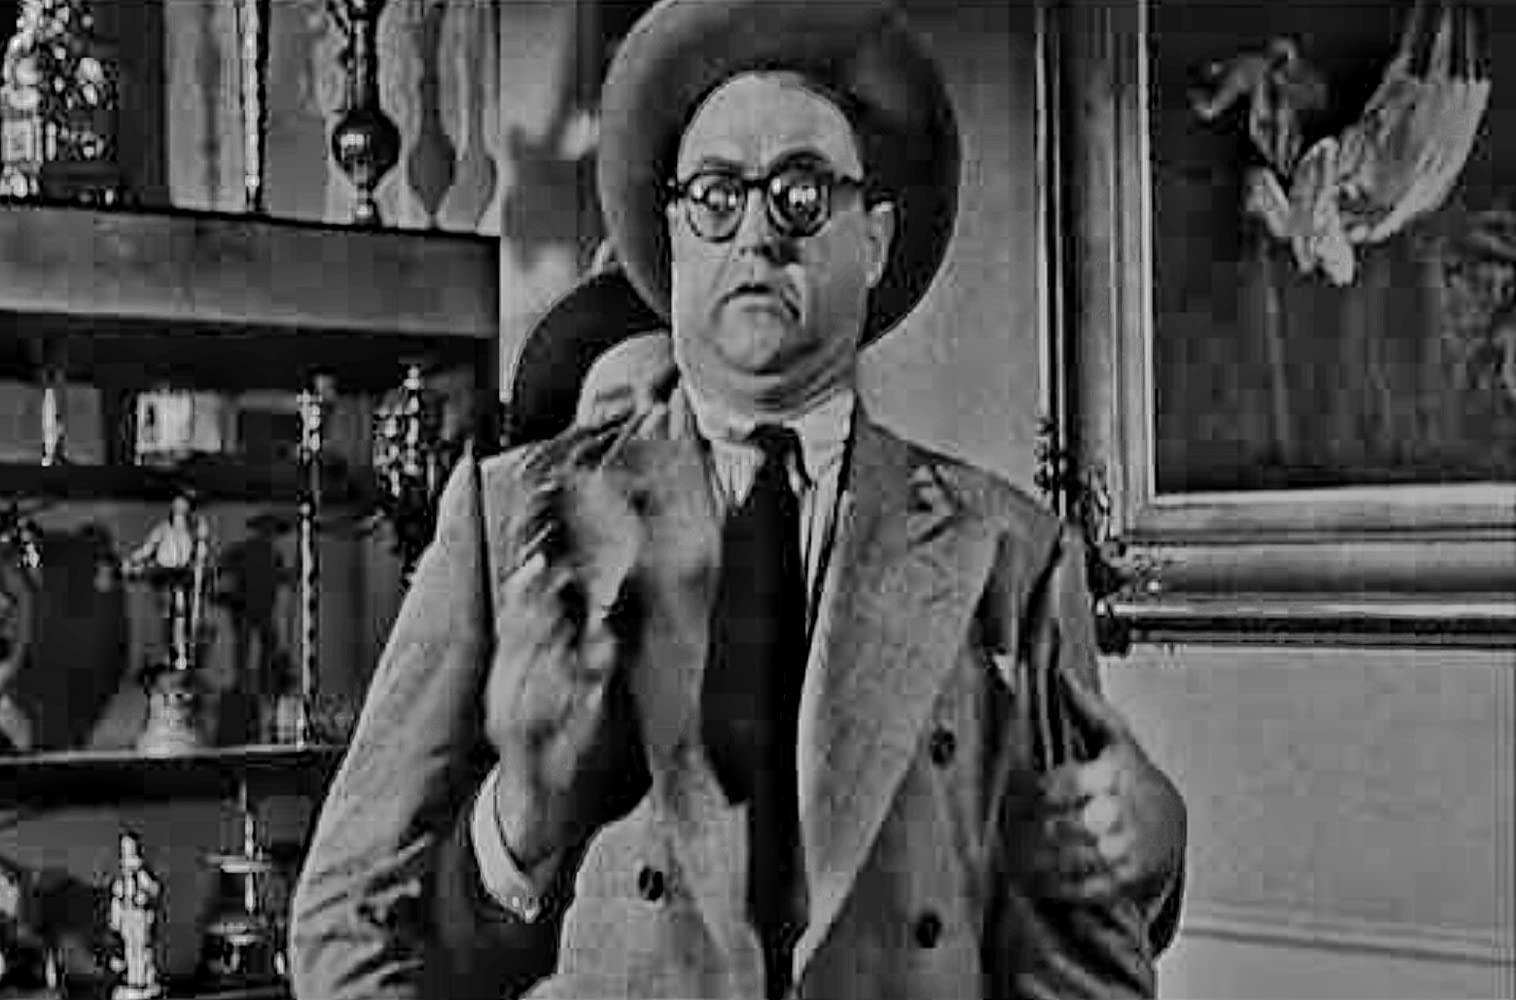 Joe Besser Short, chubby, balding, childish character actor who began his career on the vaudeville. joe besser